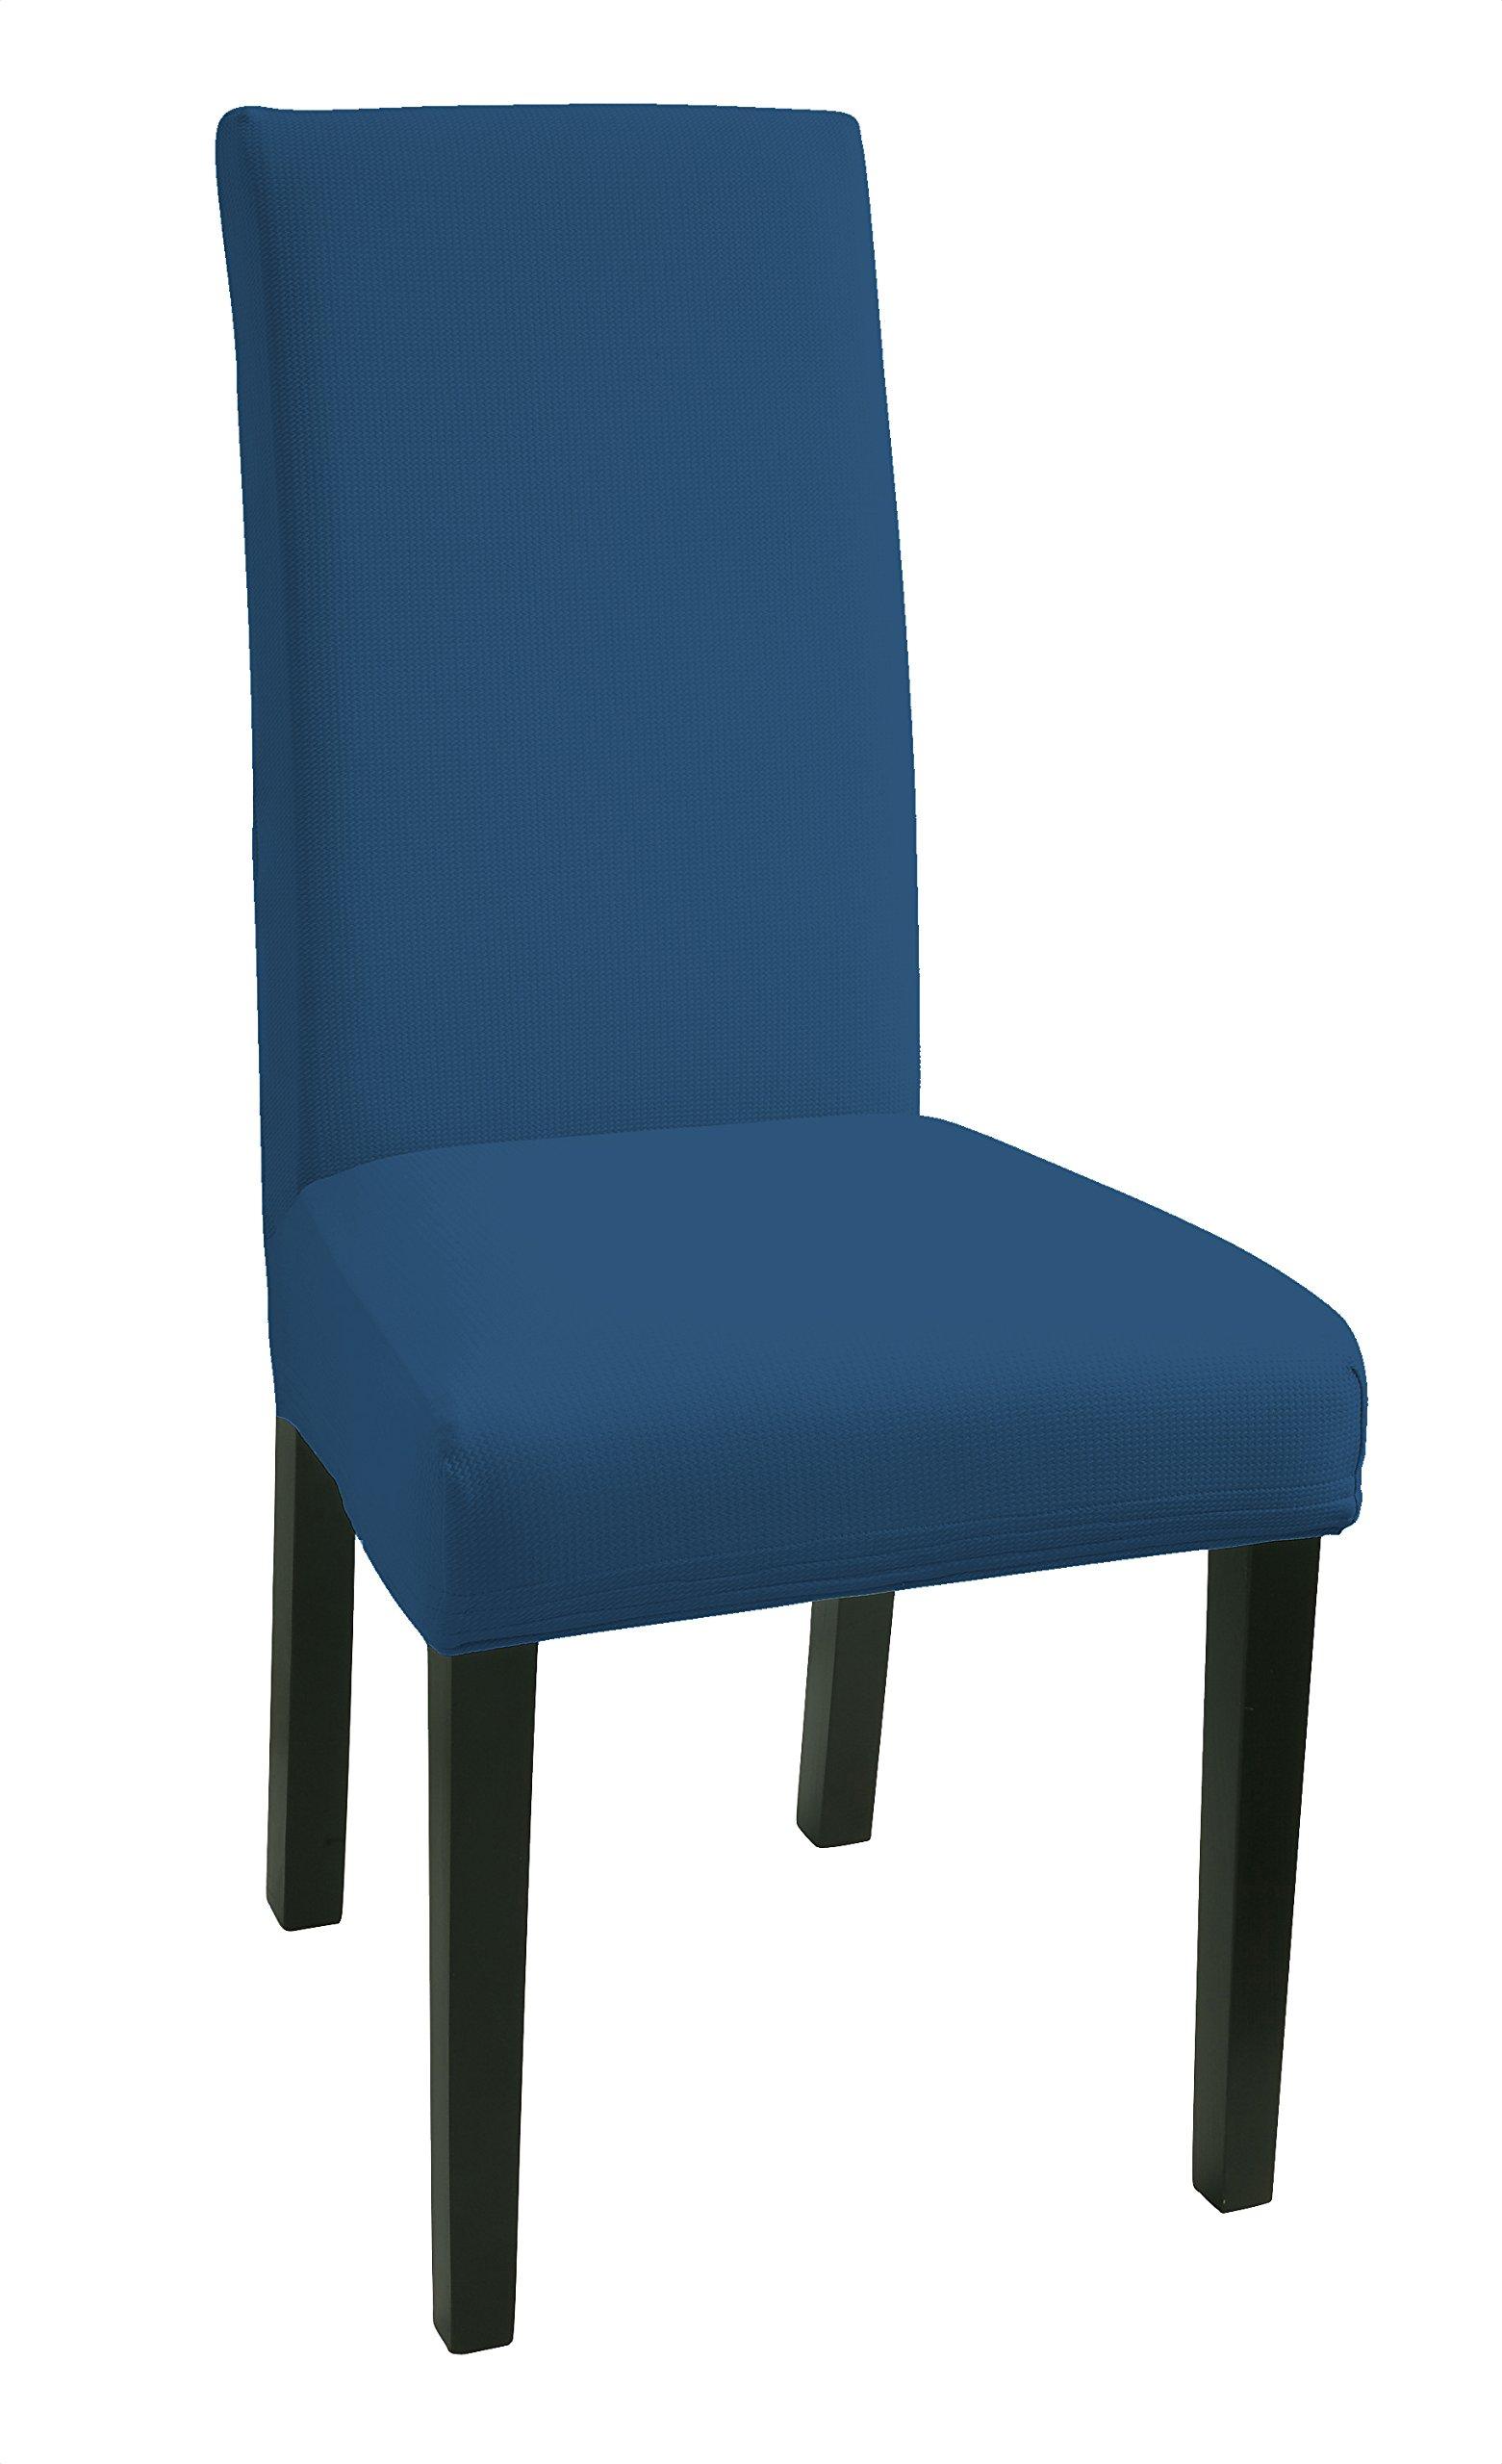 Stuhl rckenlehne selbst beziehen elegant sofa neu polstern schritt with stuhl rckenlehne selbst - Stuhle selbst beziehen ...